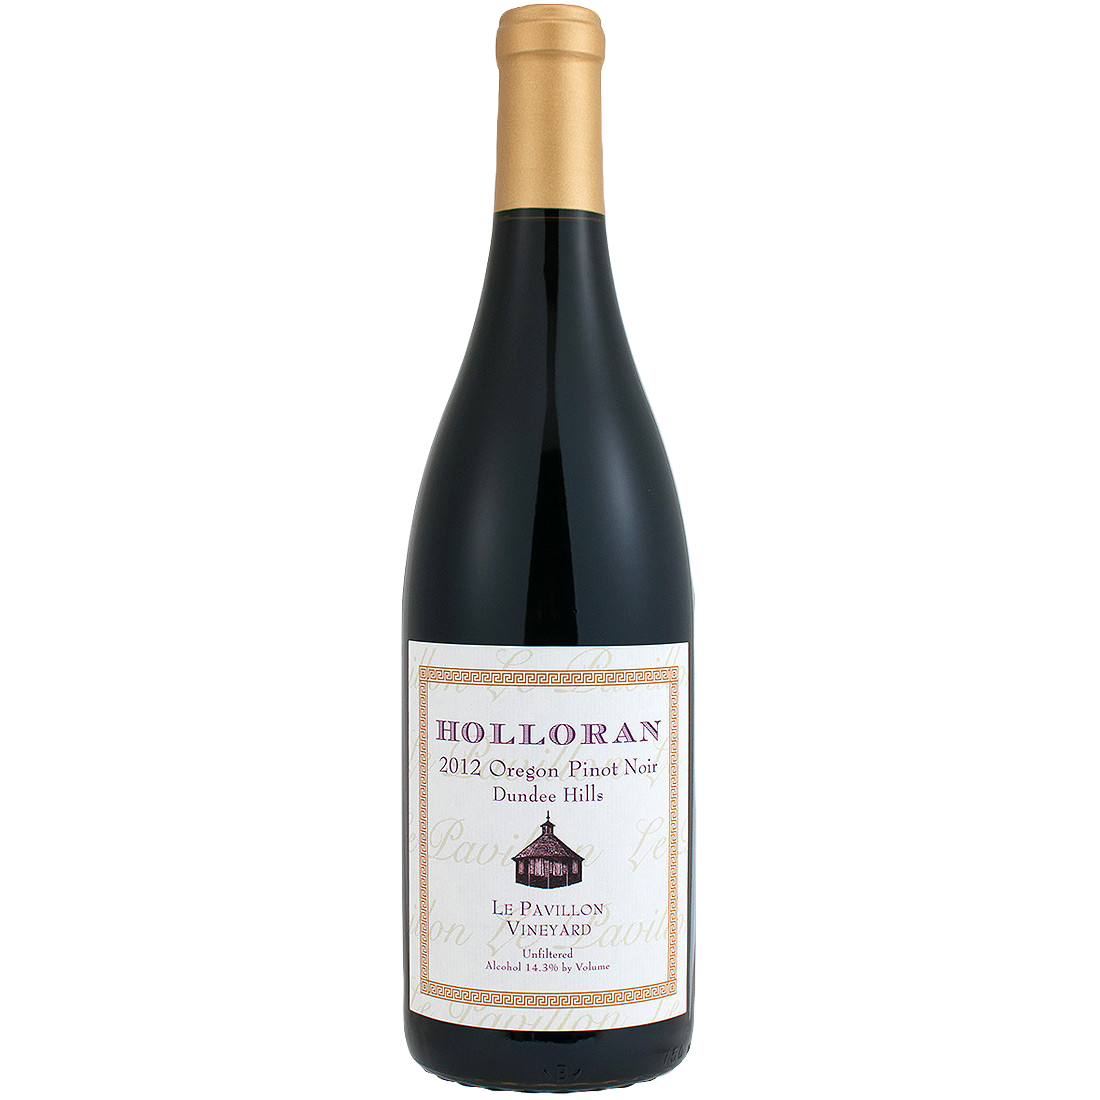 Holloran Pinot Noir Le Pavillon Vineyard